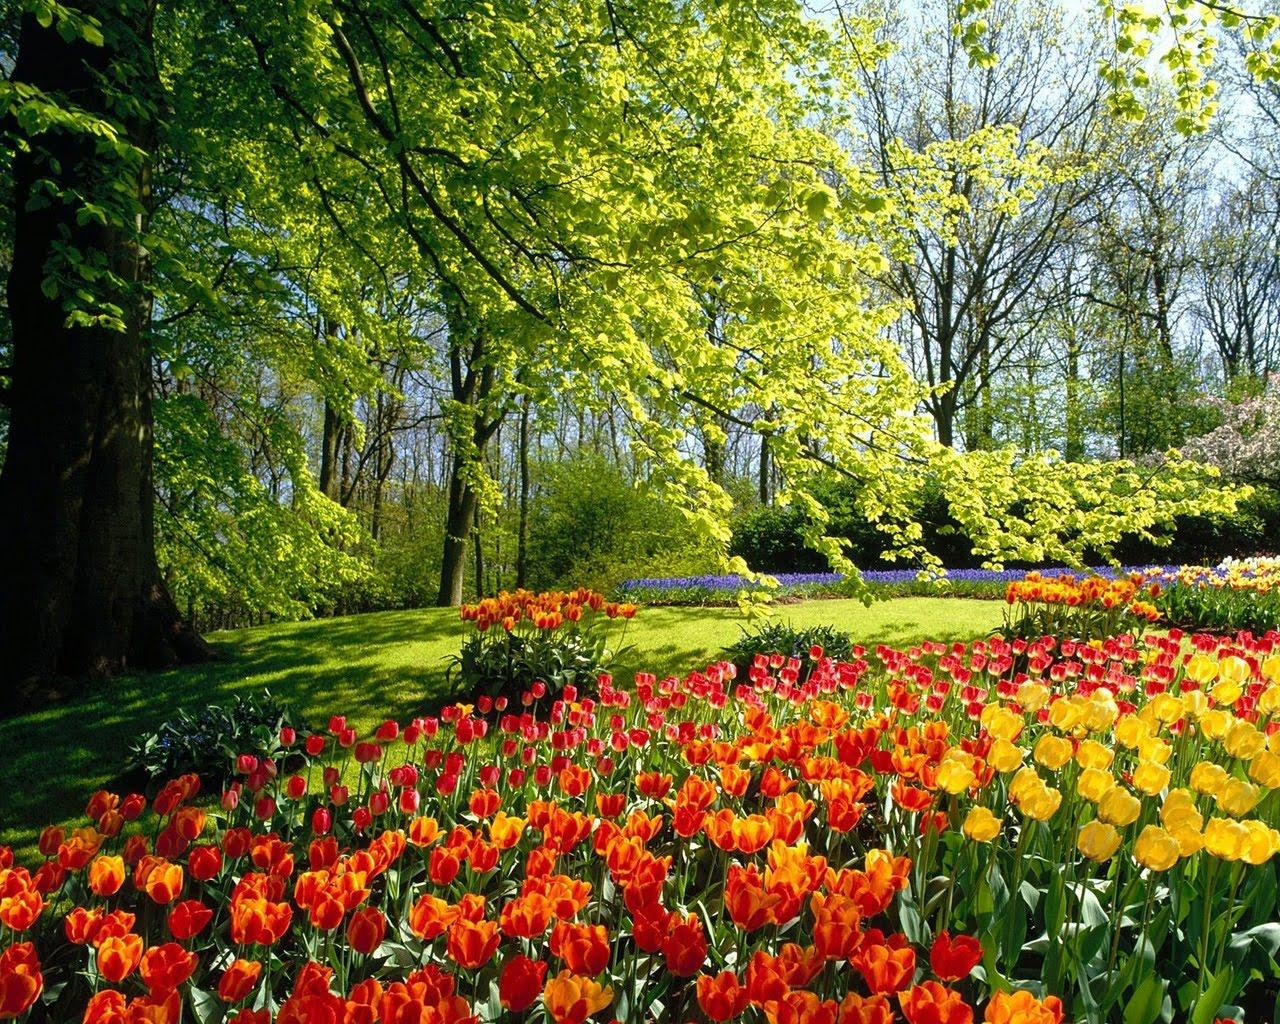 http://4.bp.blogspot.com/-N0bGQmfLGqc/Tai0fo8fzXI/AAAAAAAAAHg/iJc-HrHDWbM/s1600/spring_park_wallpaper_spring_nature_wallpaper_1280_1024_1215.jpg